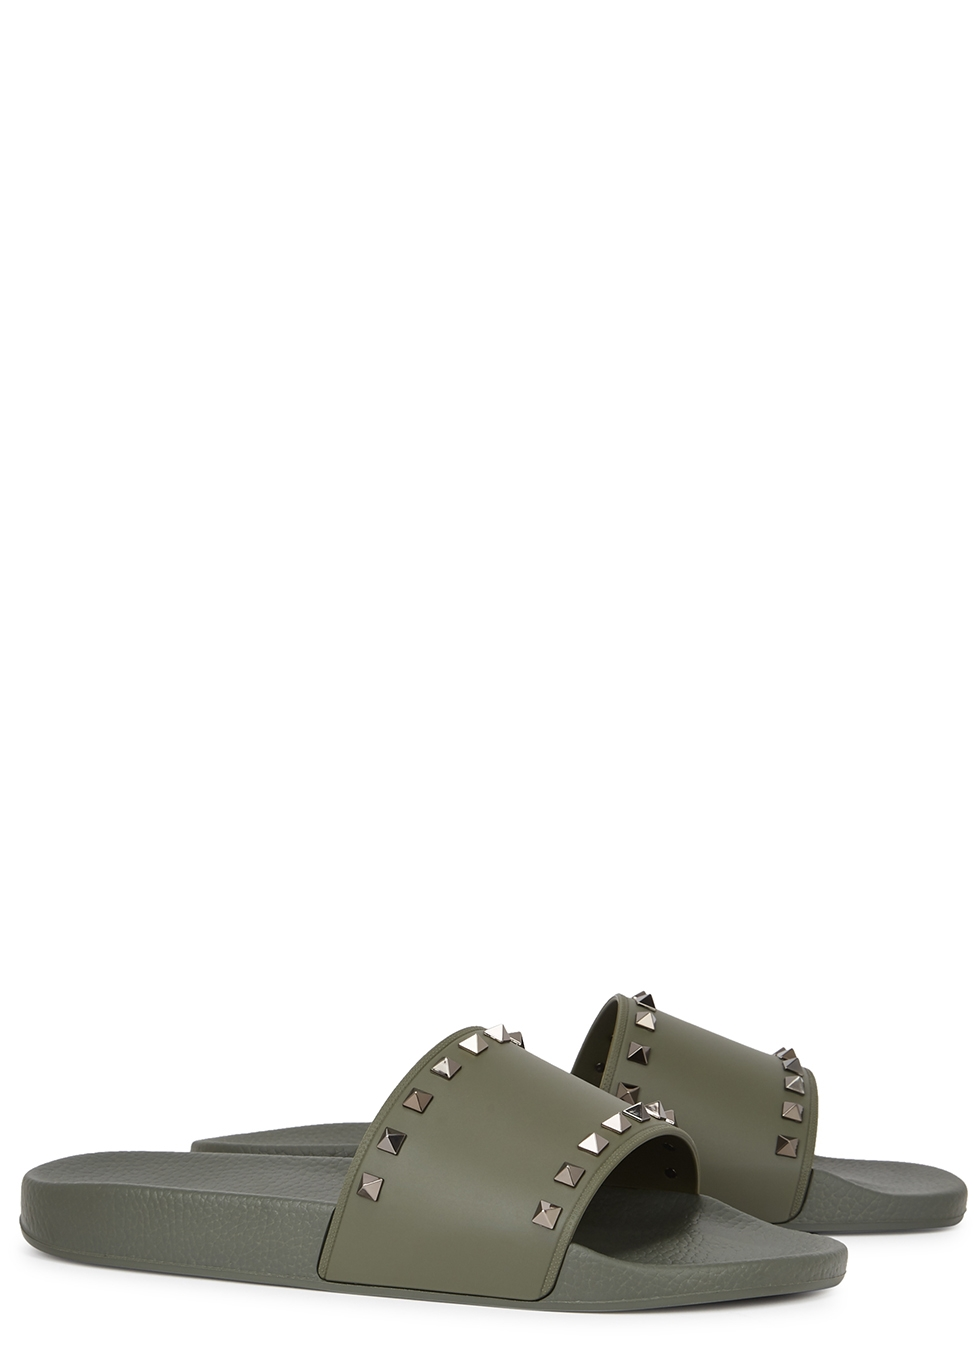 efdd95bbd21357 Men s Designer Sandals